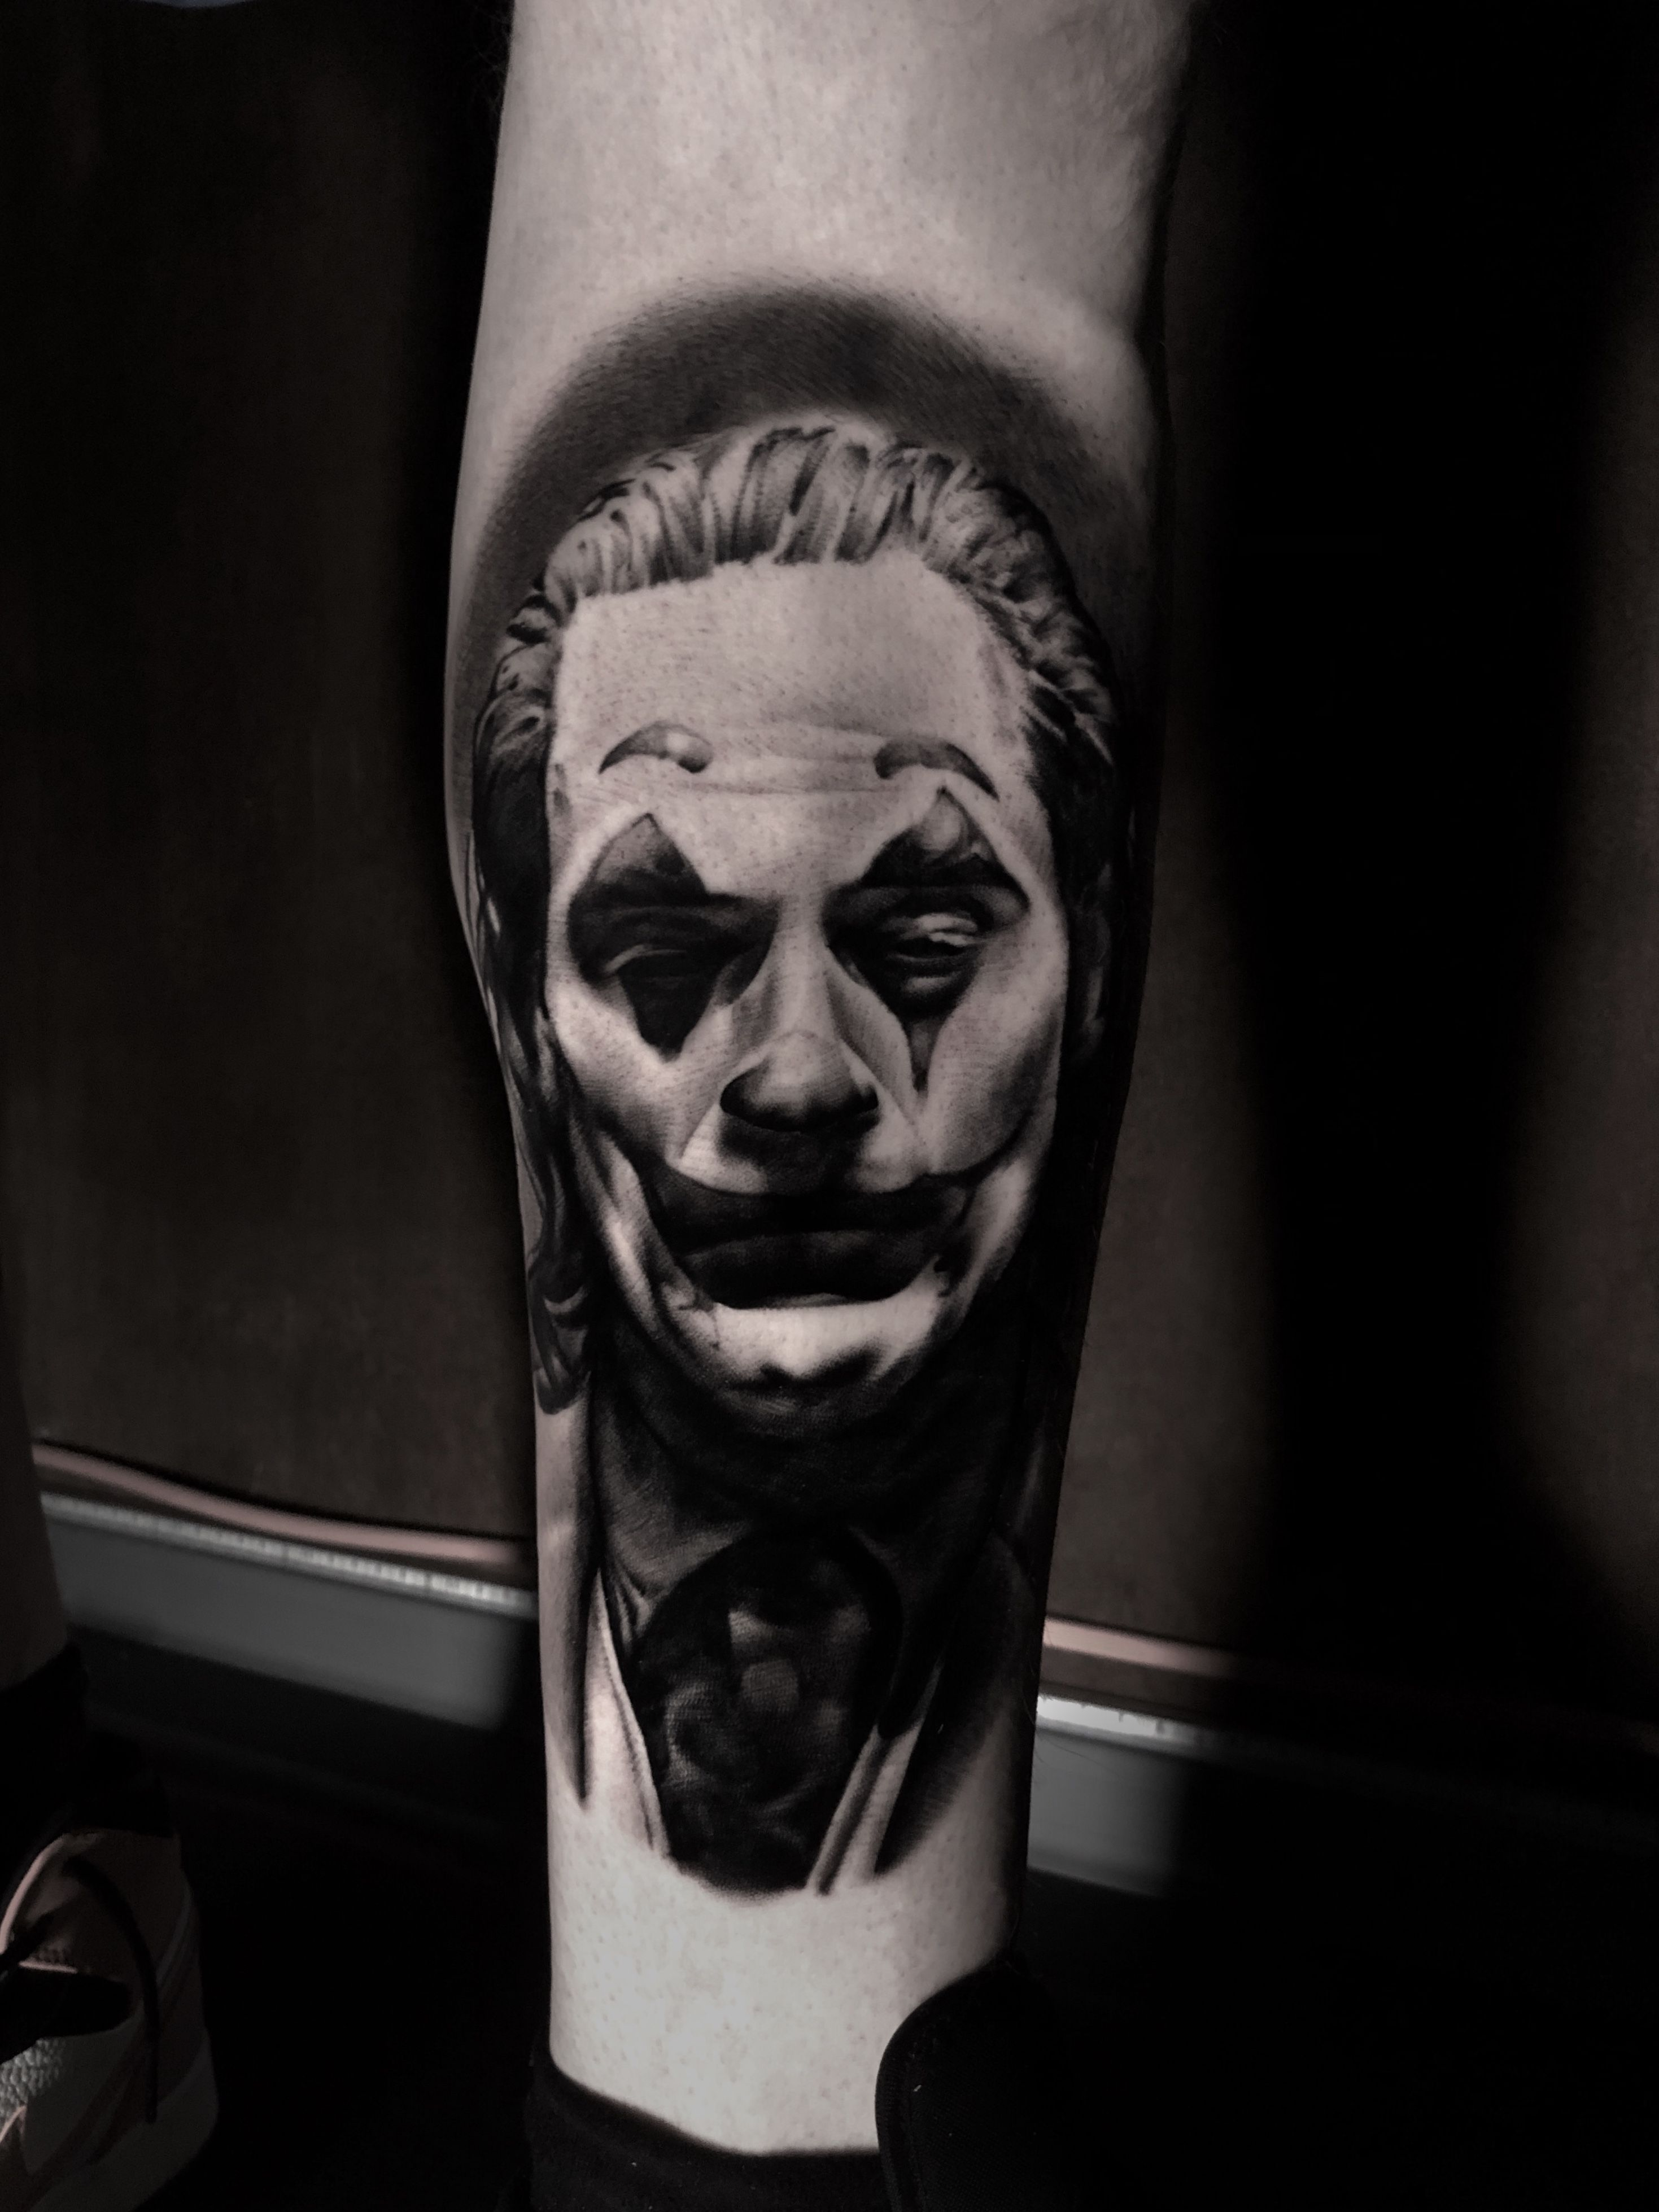 Joker Tattoo Joker Tattoo Design Joker Tattoo Phoenix Tattoo Design Joker tattoo pics hd